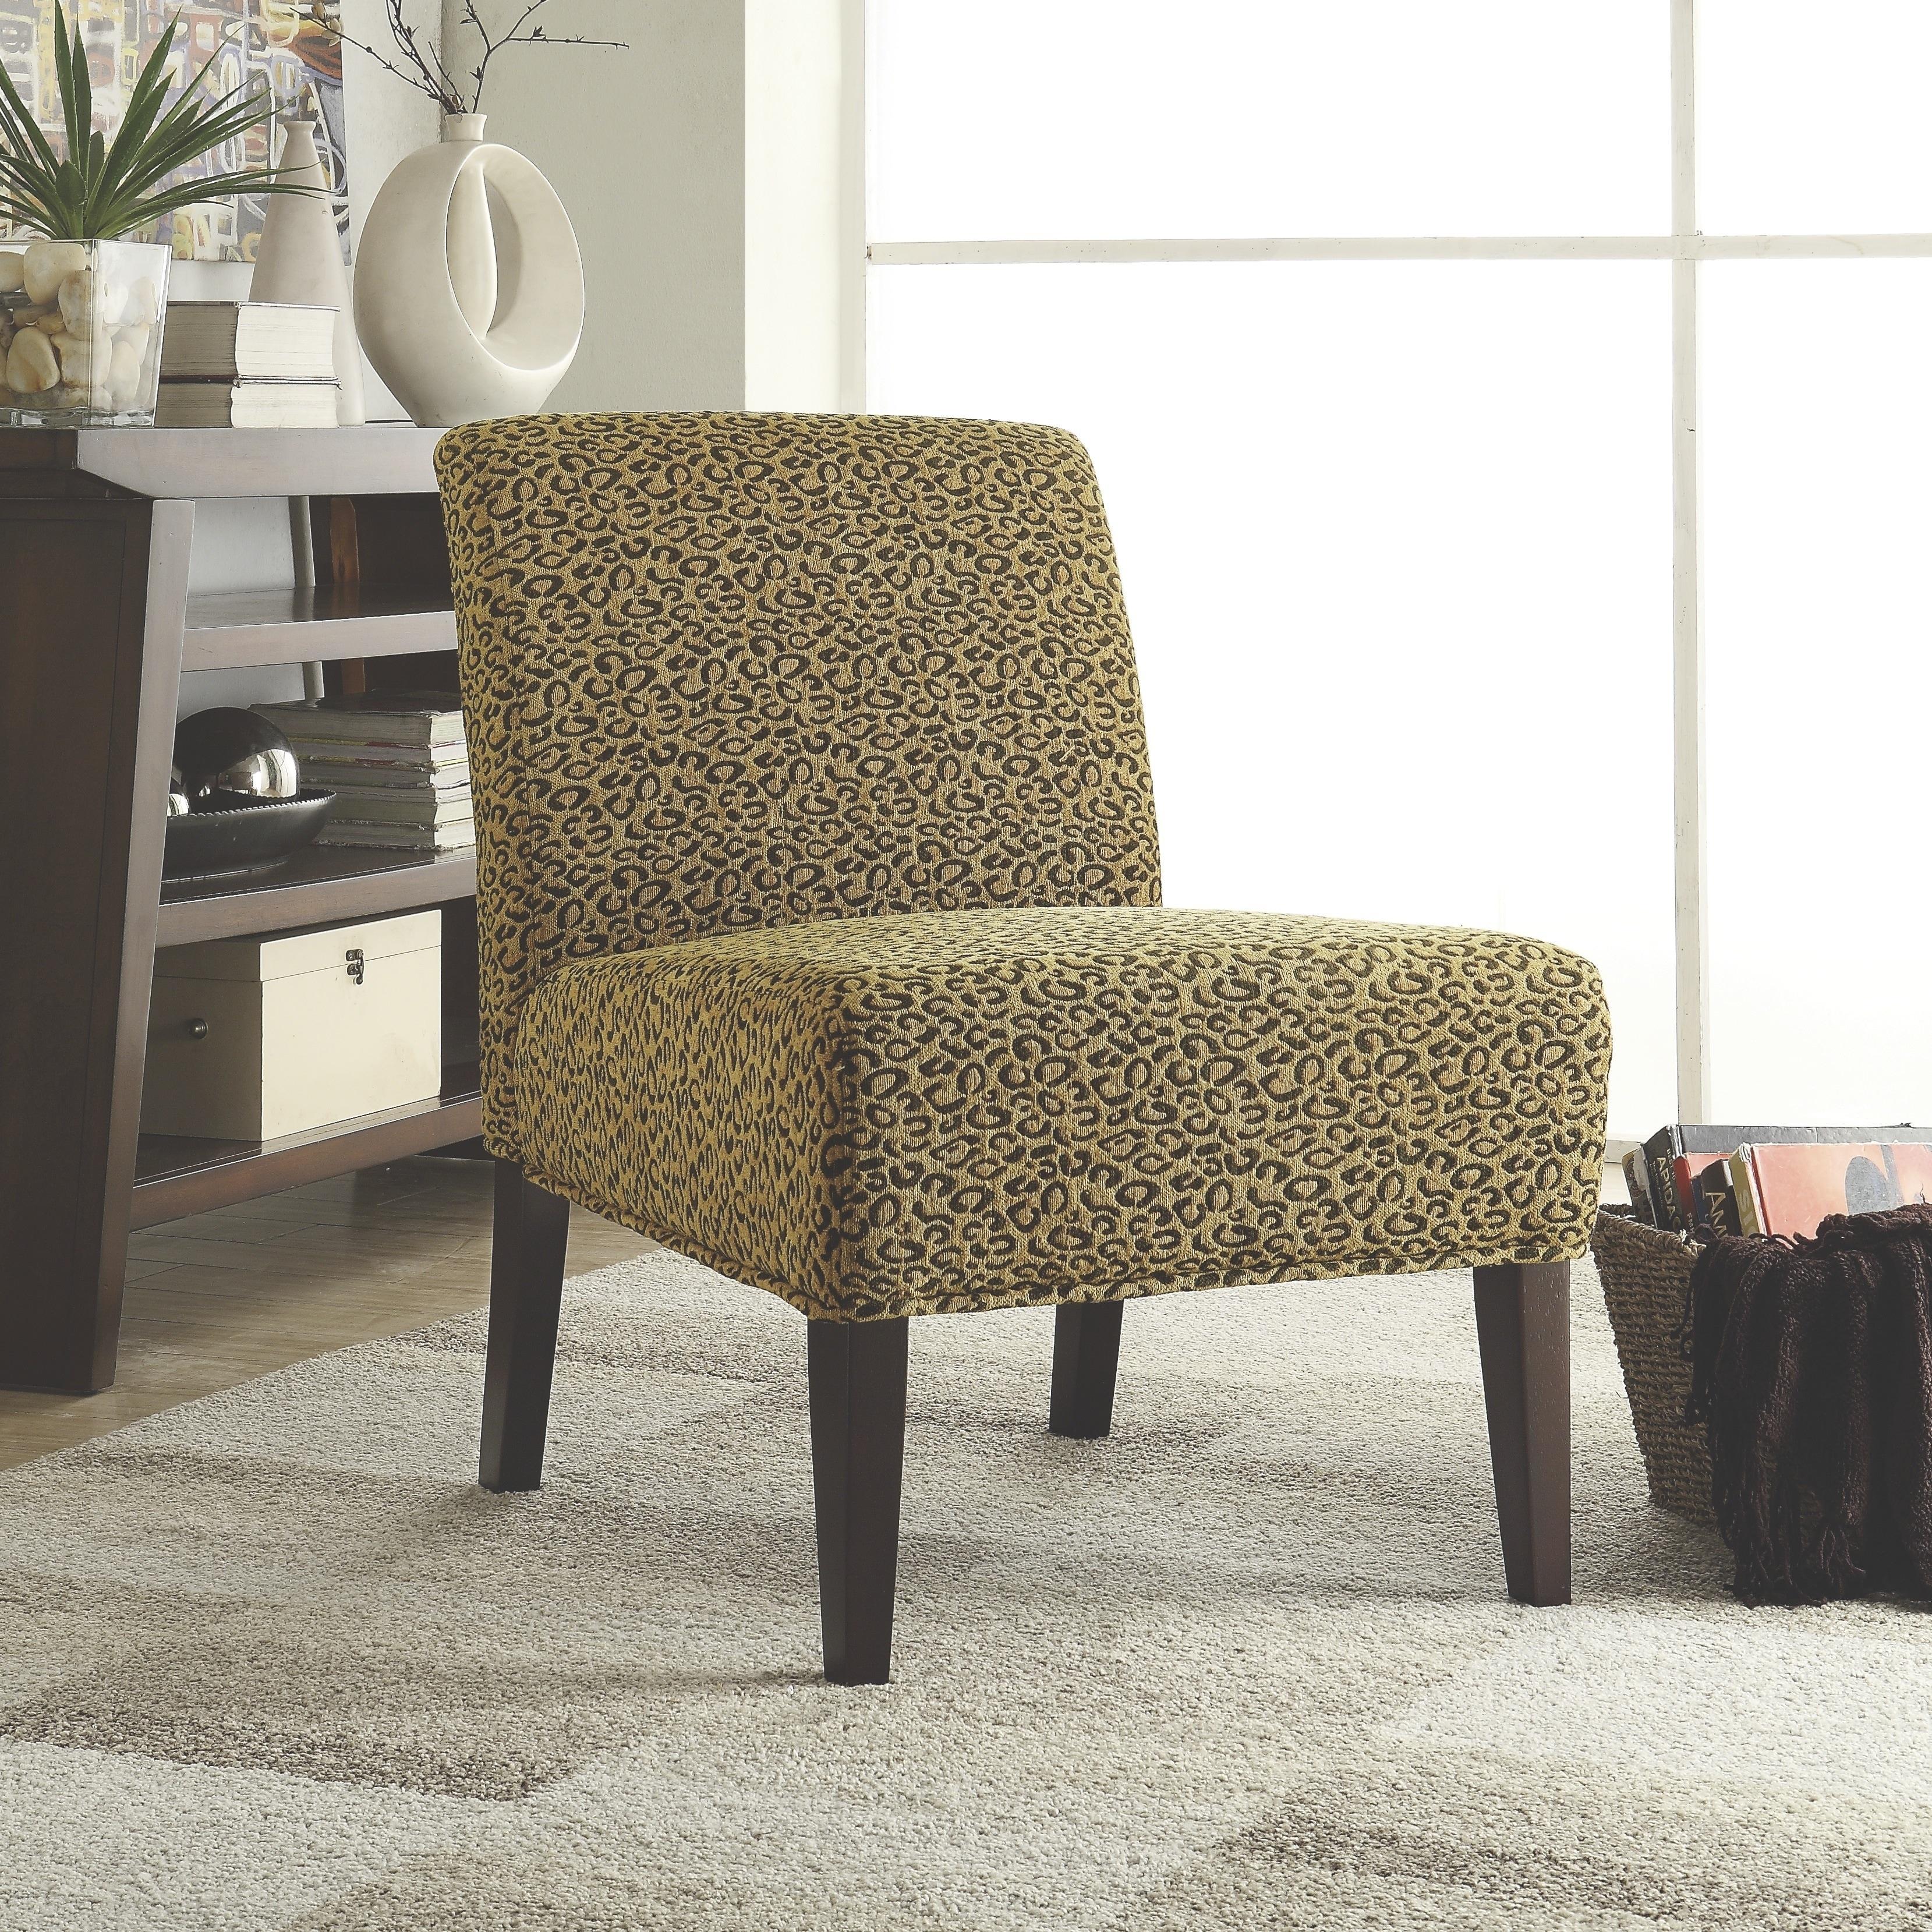 Coaster Furniture Leopard Chenille Accent Chair (Leopard)...